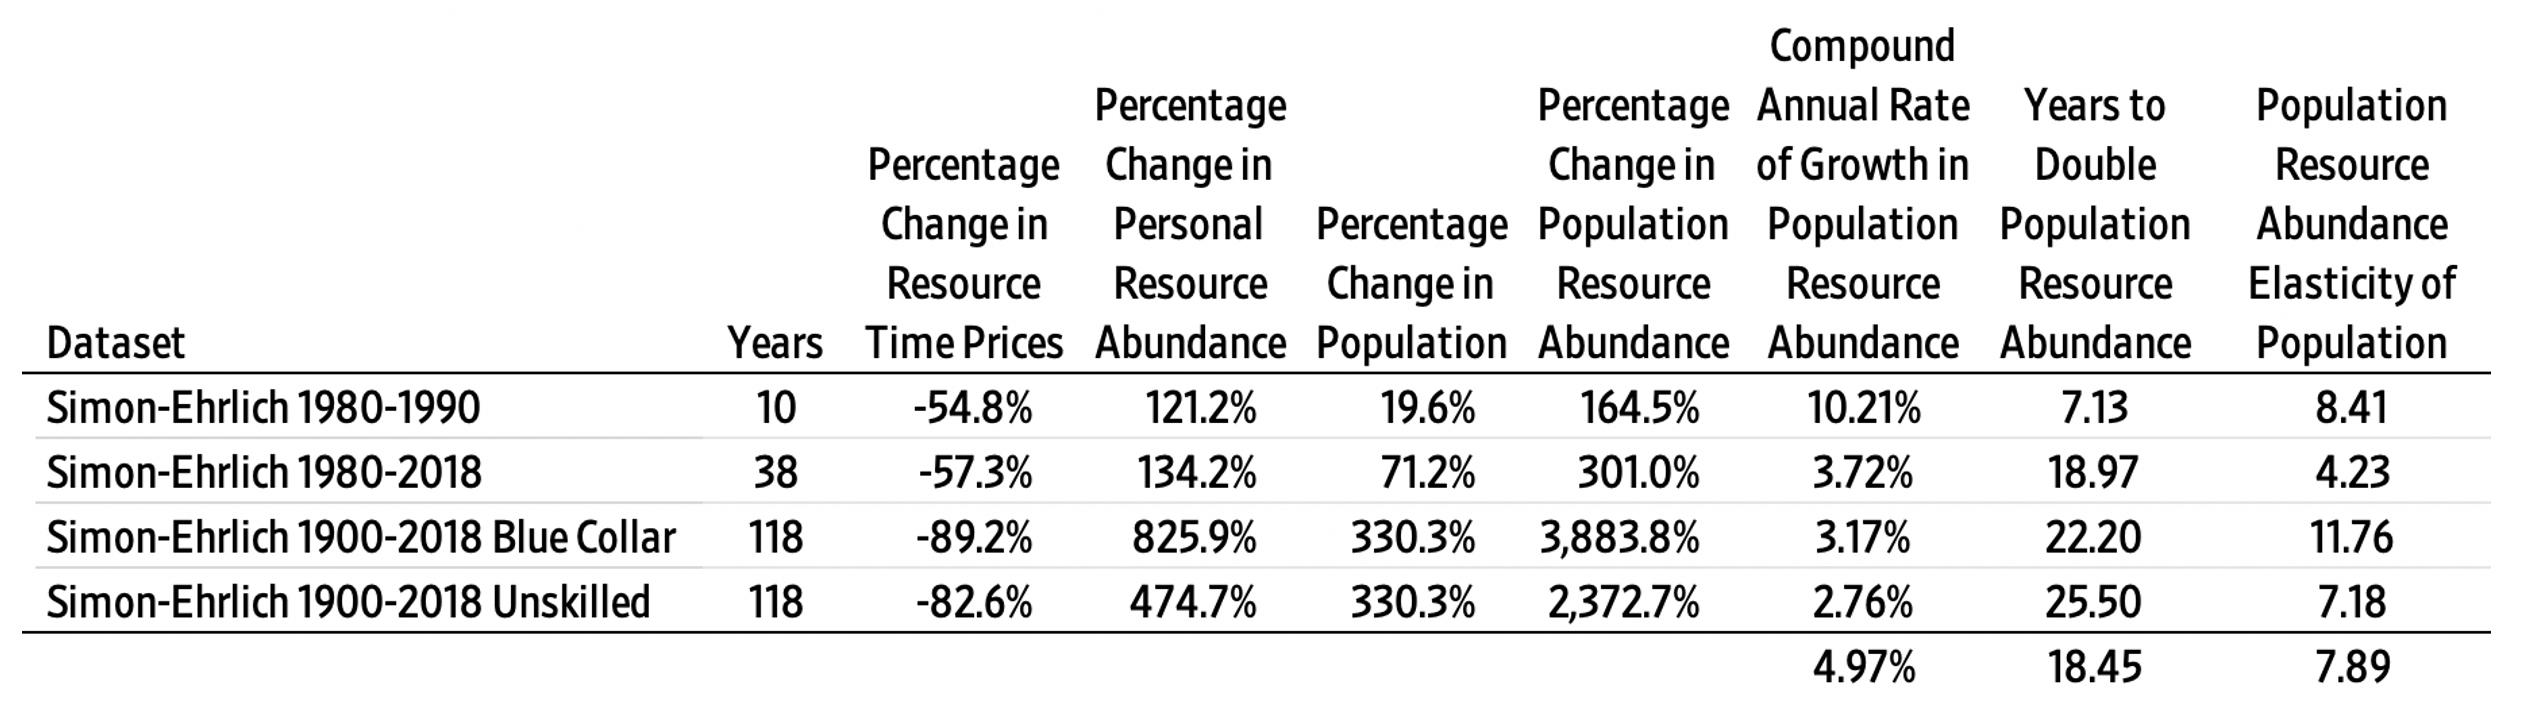 Population Resource Abundance Analysis of the Simon-Ehrlich Wager